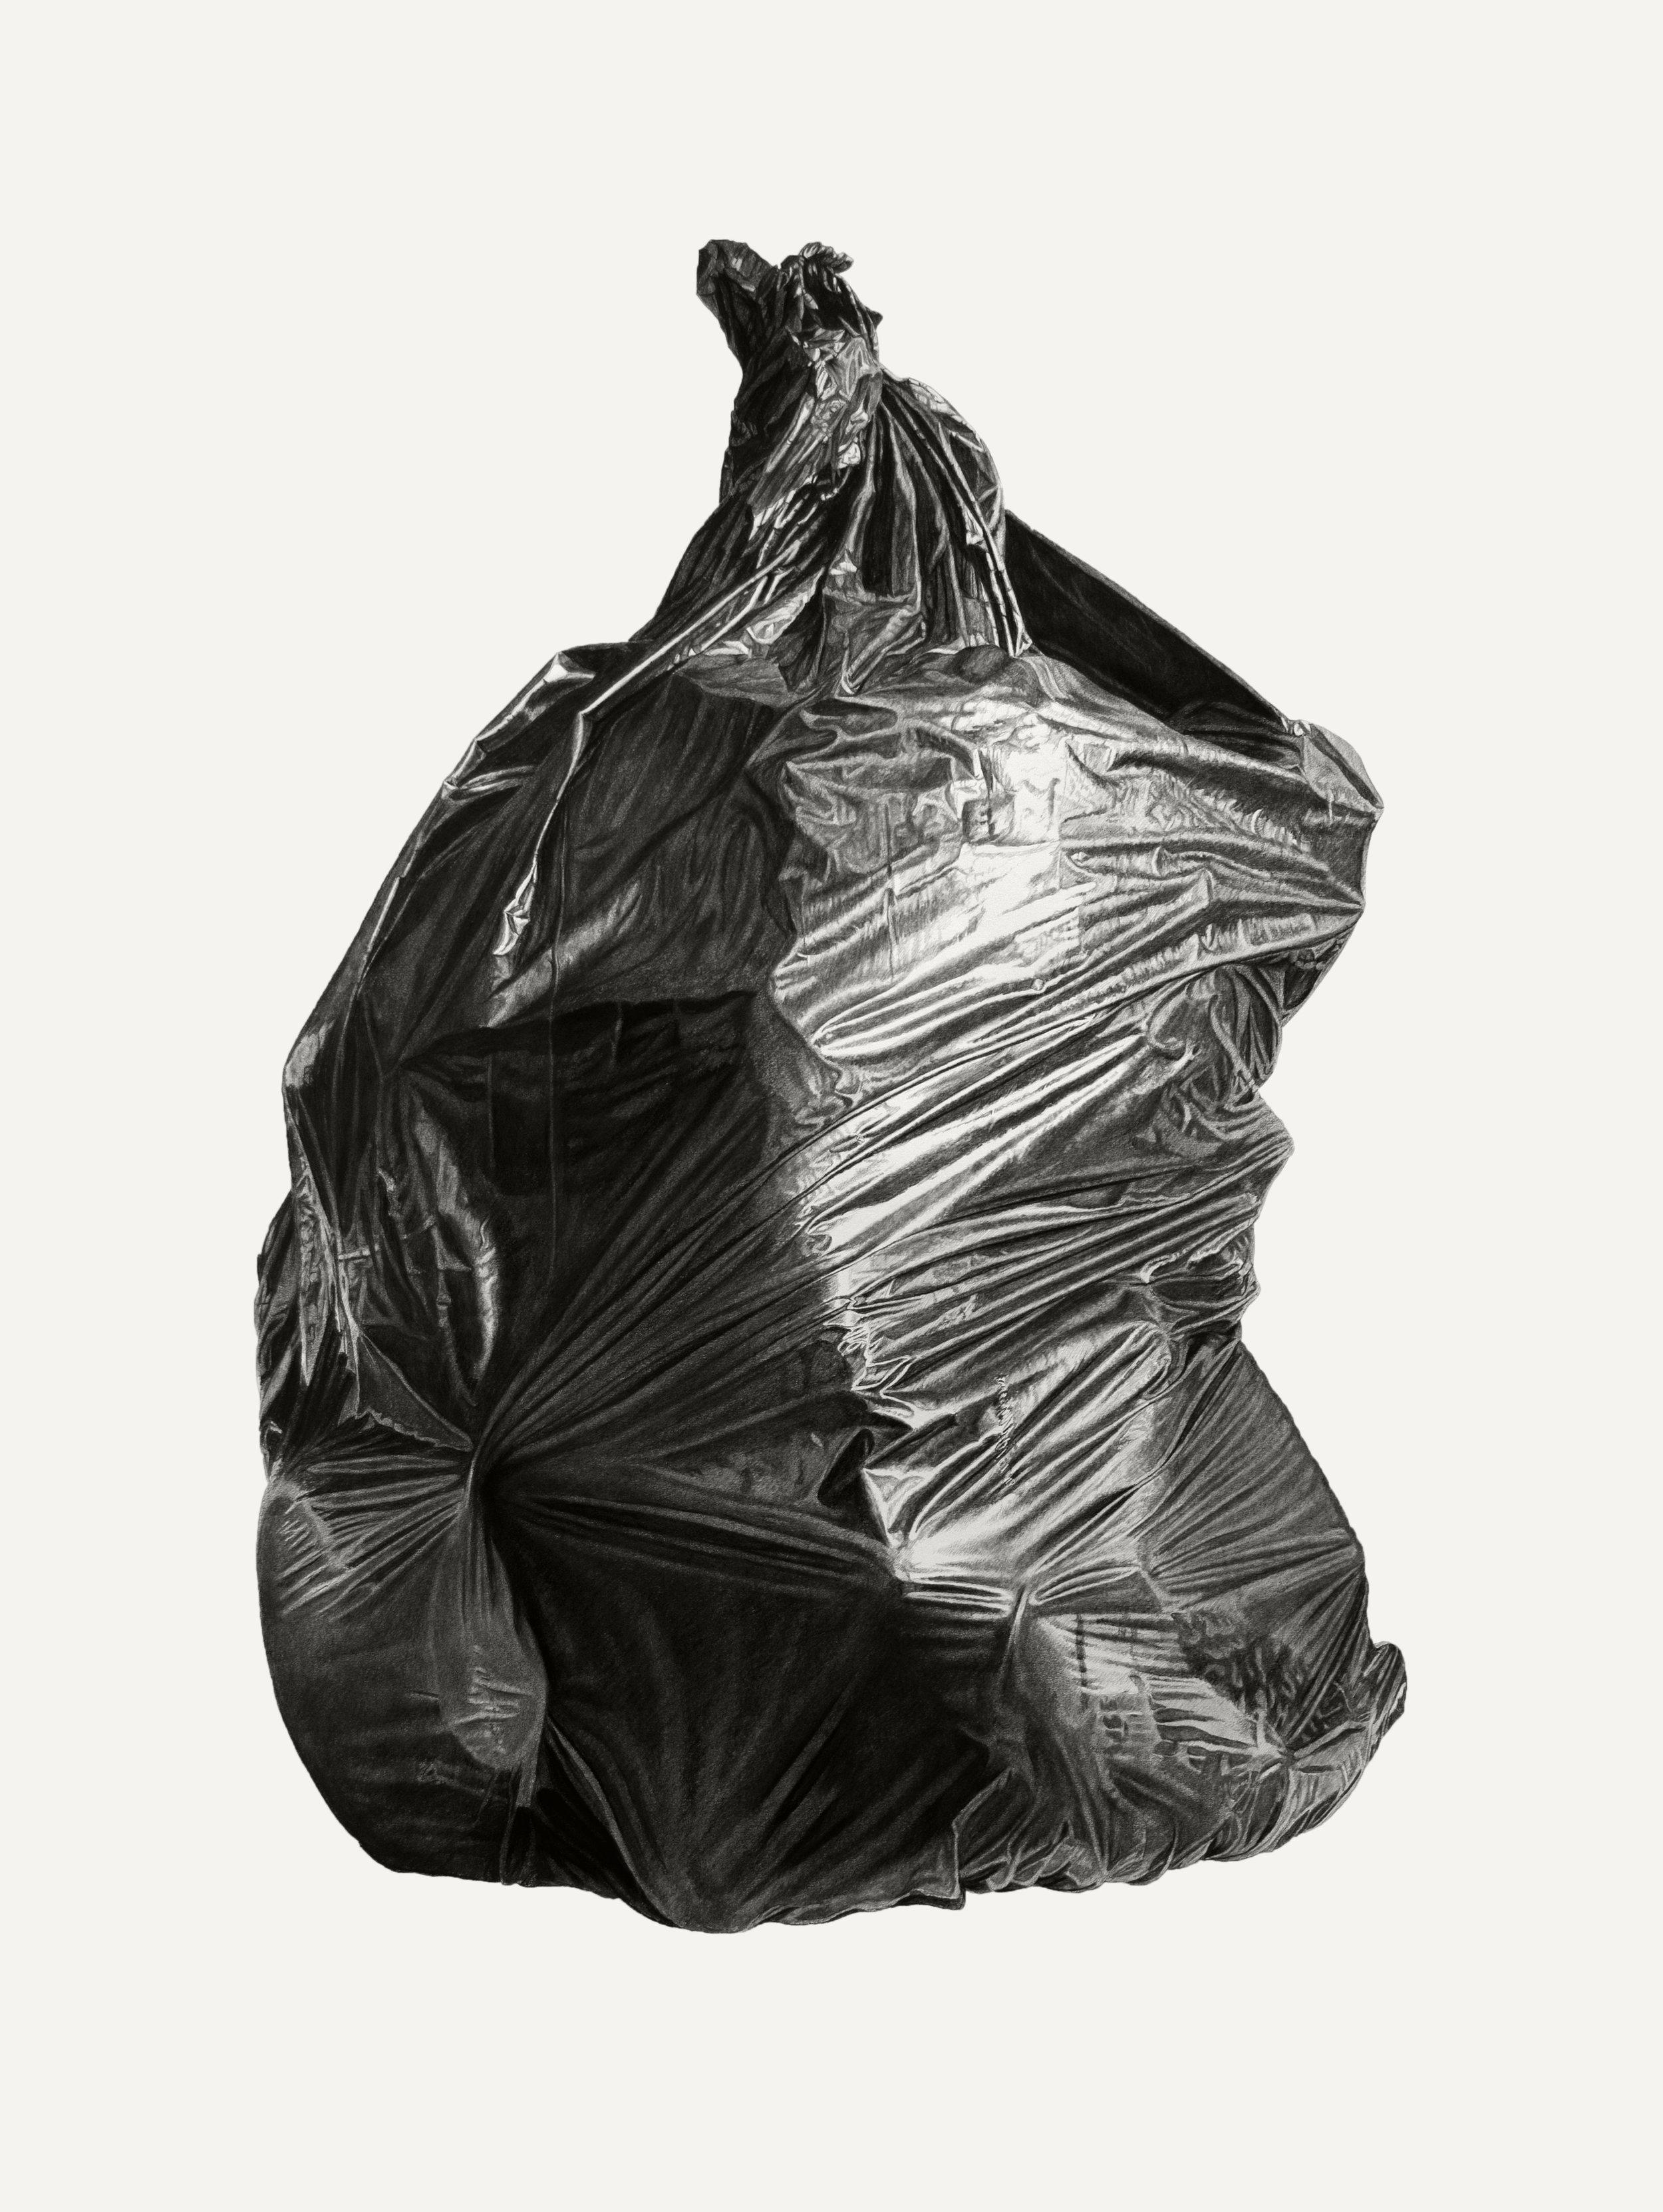 Neighborhood Still Life #9 (Black Bag)